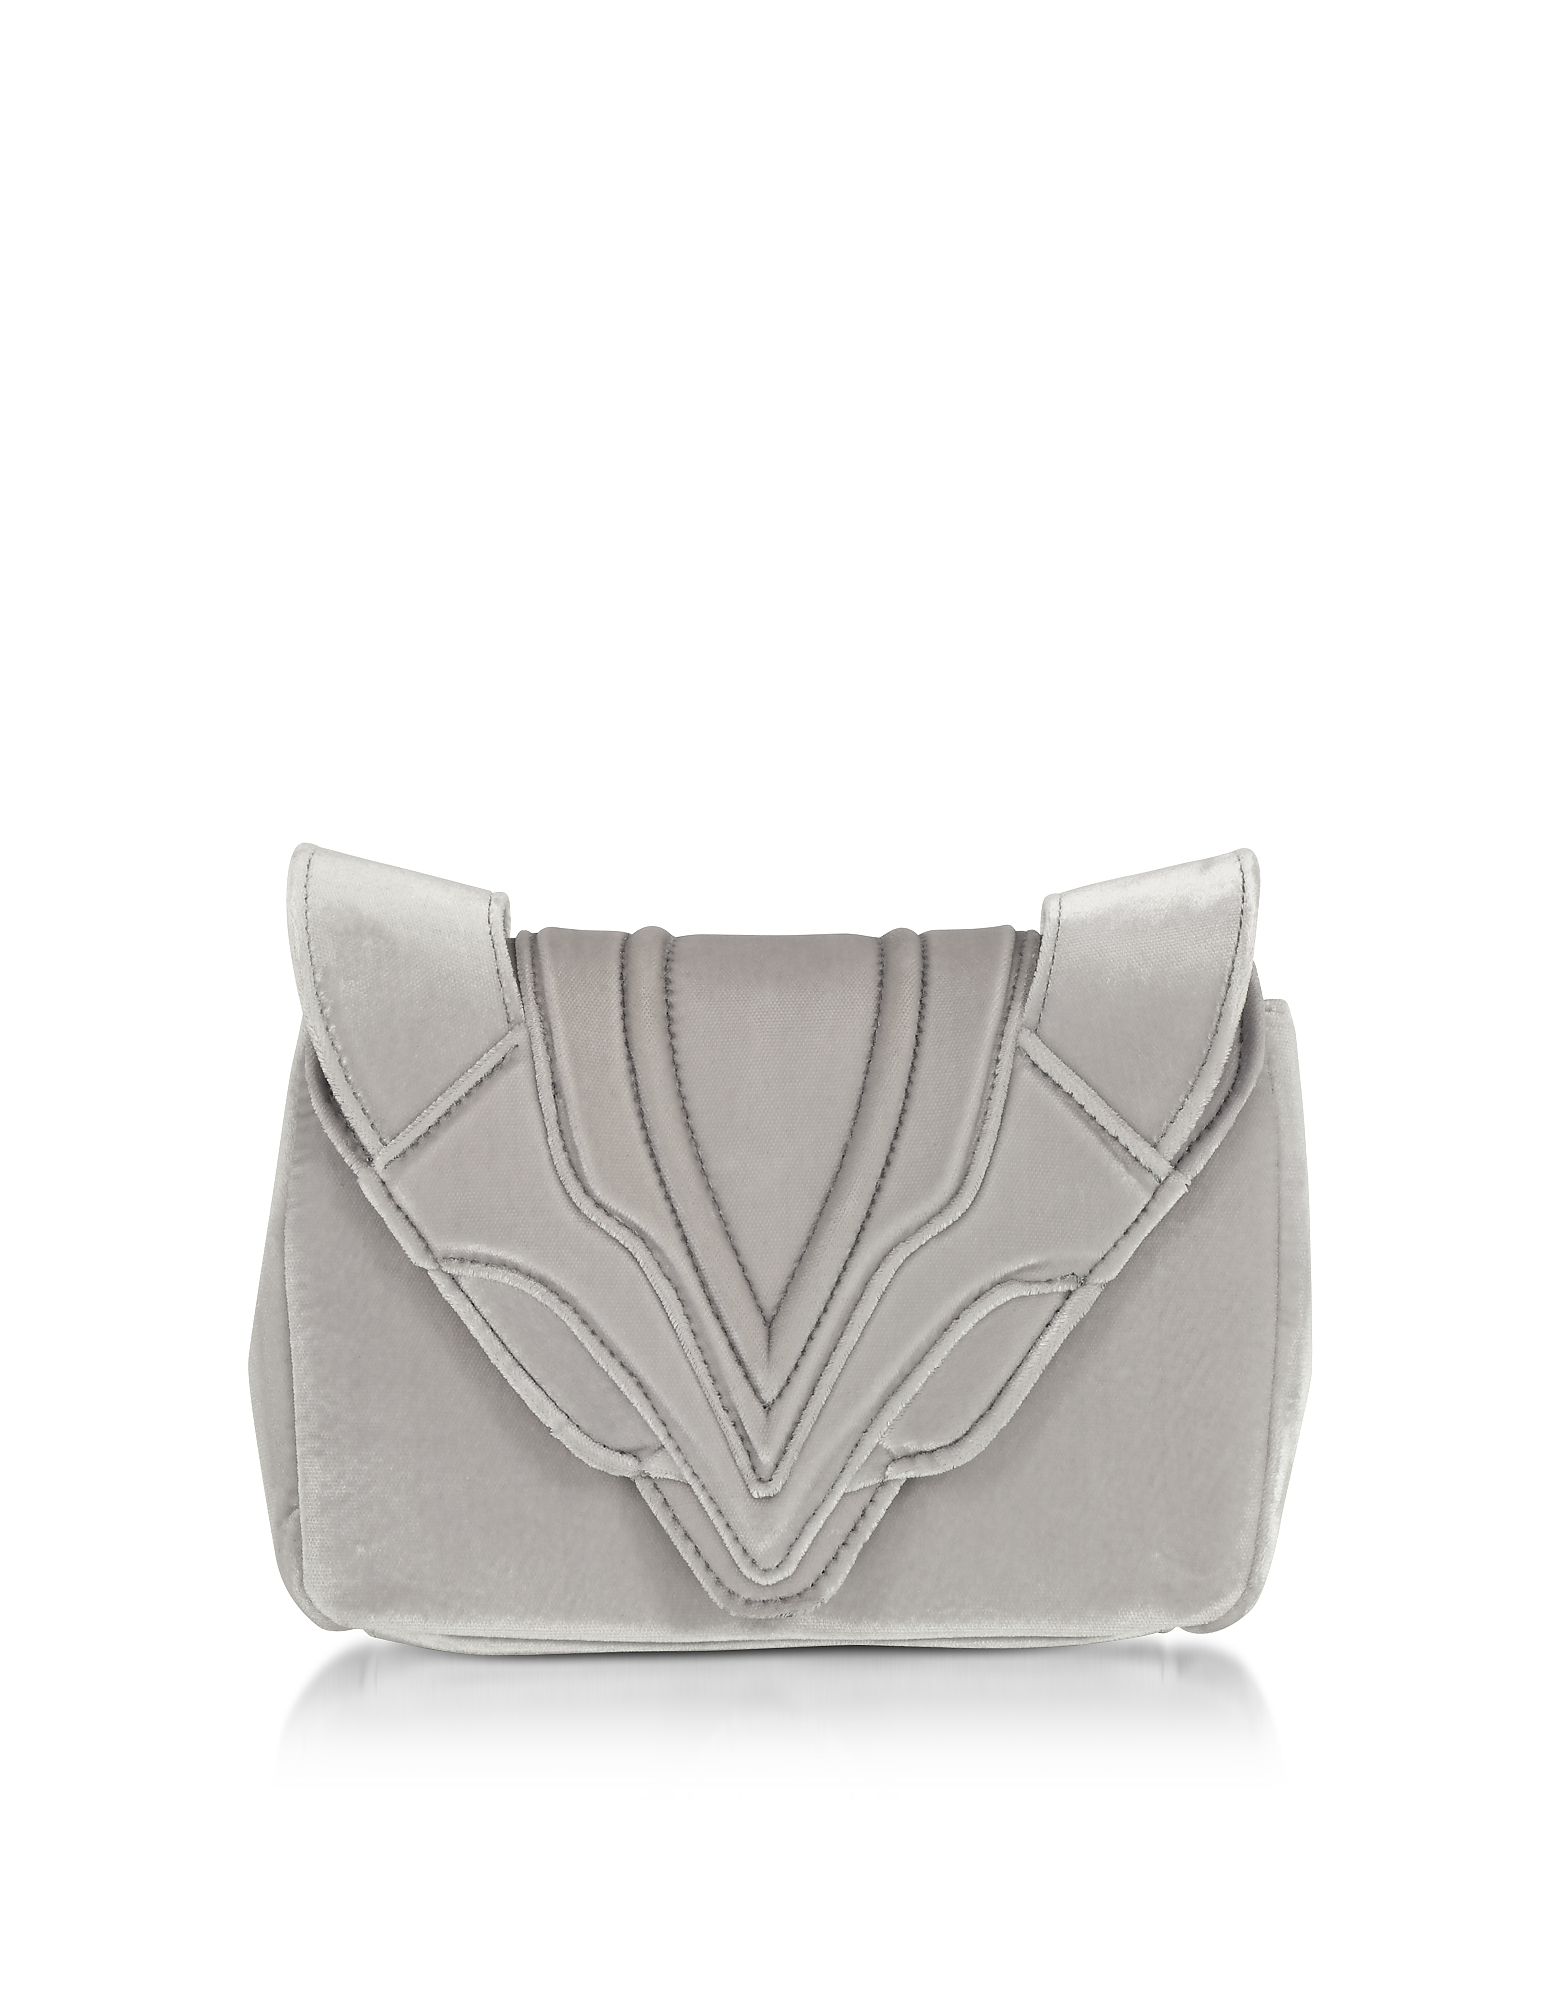 Elena Ghisellini Handbags, Silver Velvet Felix Clutch